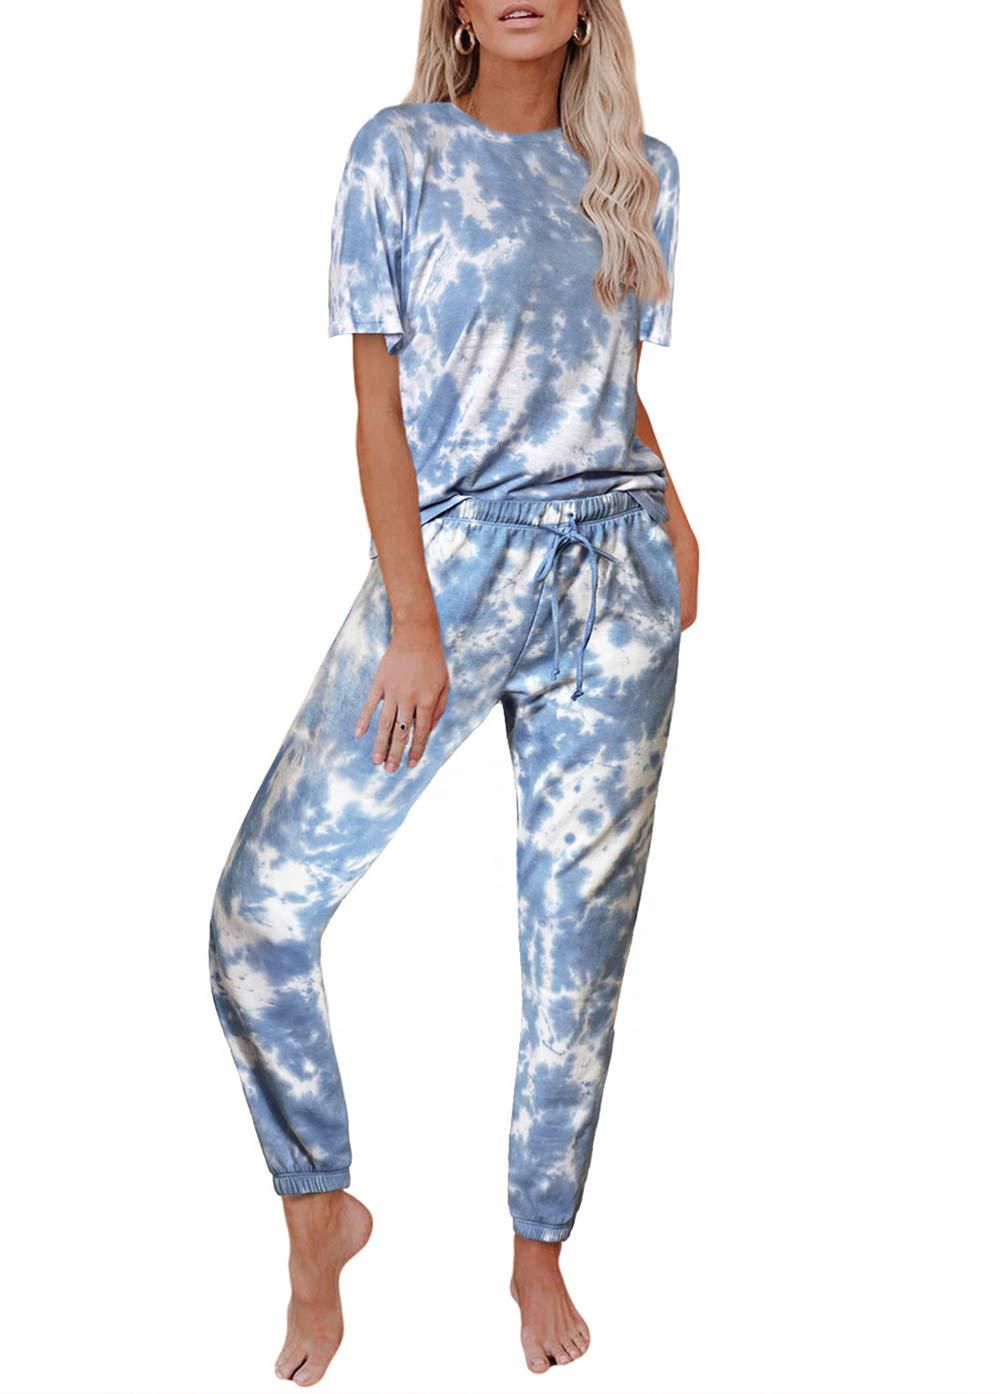 KIRUNDO Two Piece Pajamas Set Tie Dye Printed Short Sleeves T-Shirt Long Pants Joggers Sleepwear Lounge PJ Set with Belt